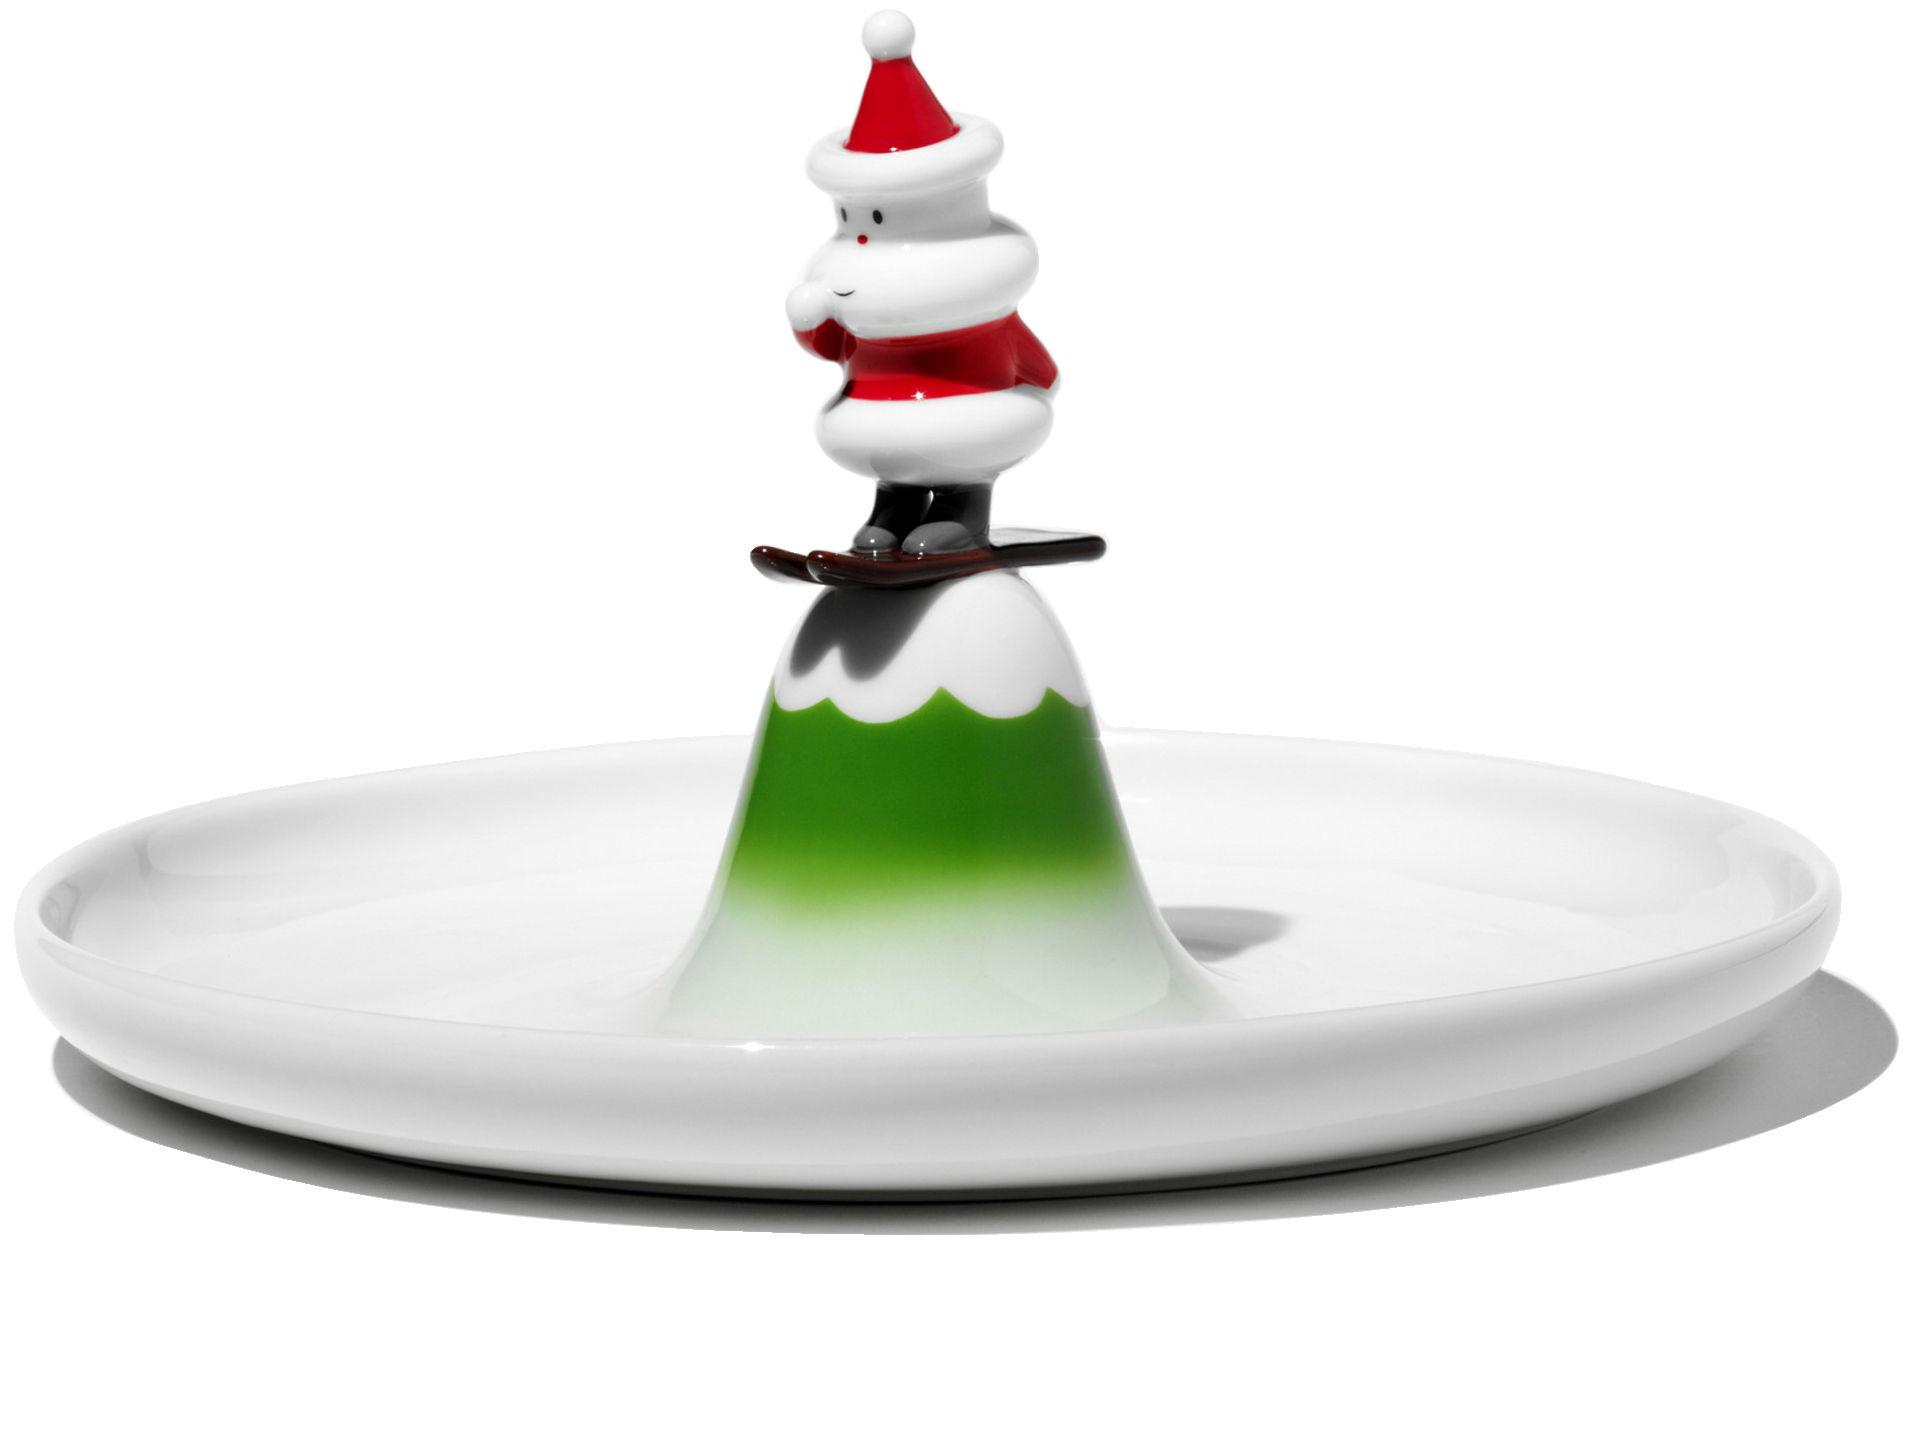 Tableware - Plates - Scia Natalino Presentation plate - Pastry plate by A di Alessi - White, green & red - Ceramic